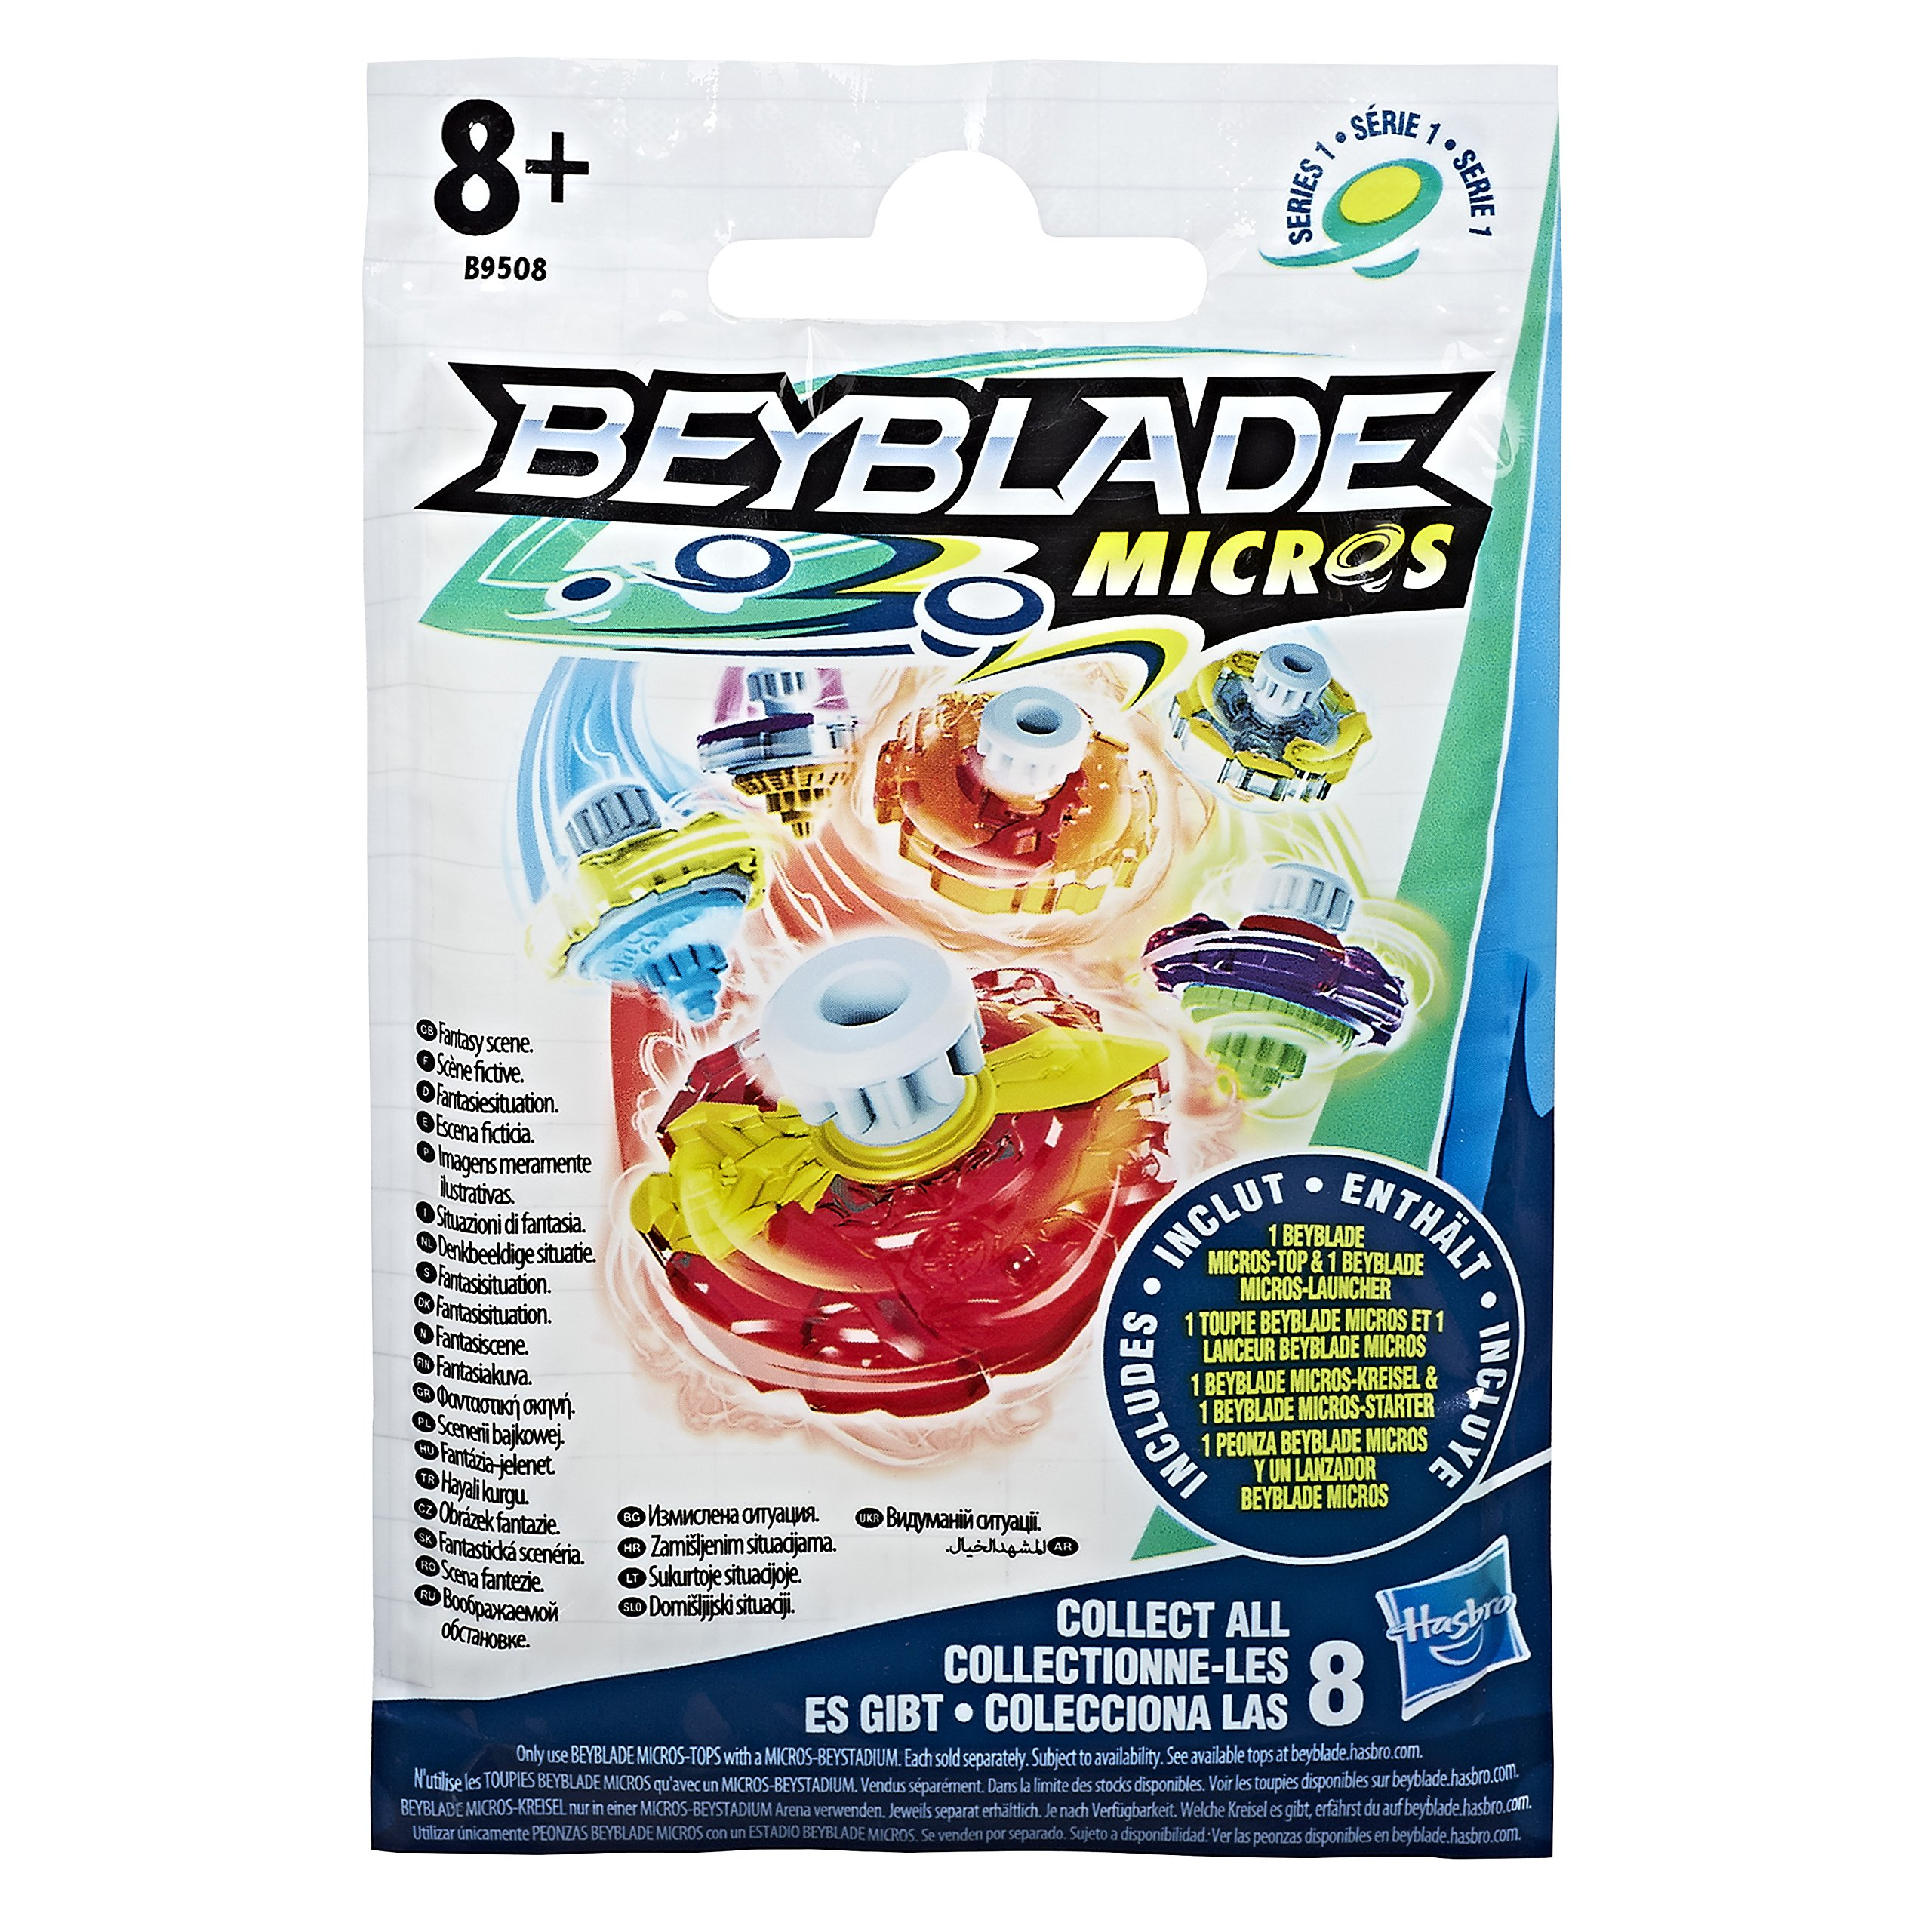 Beyblade Micros Series 3 Phantazus P2